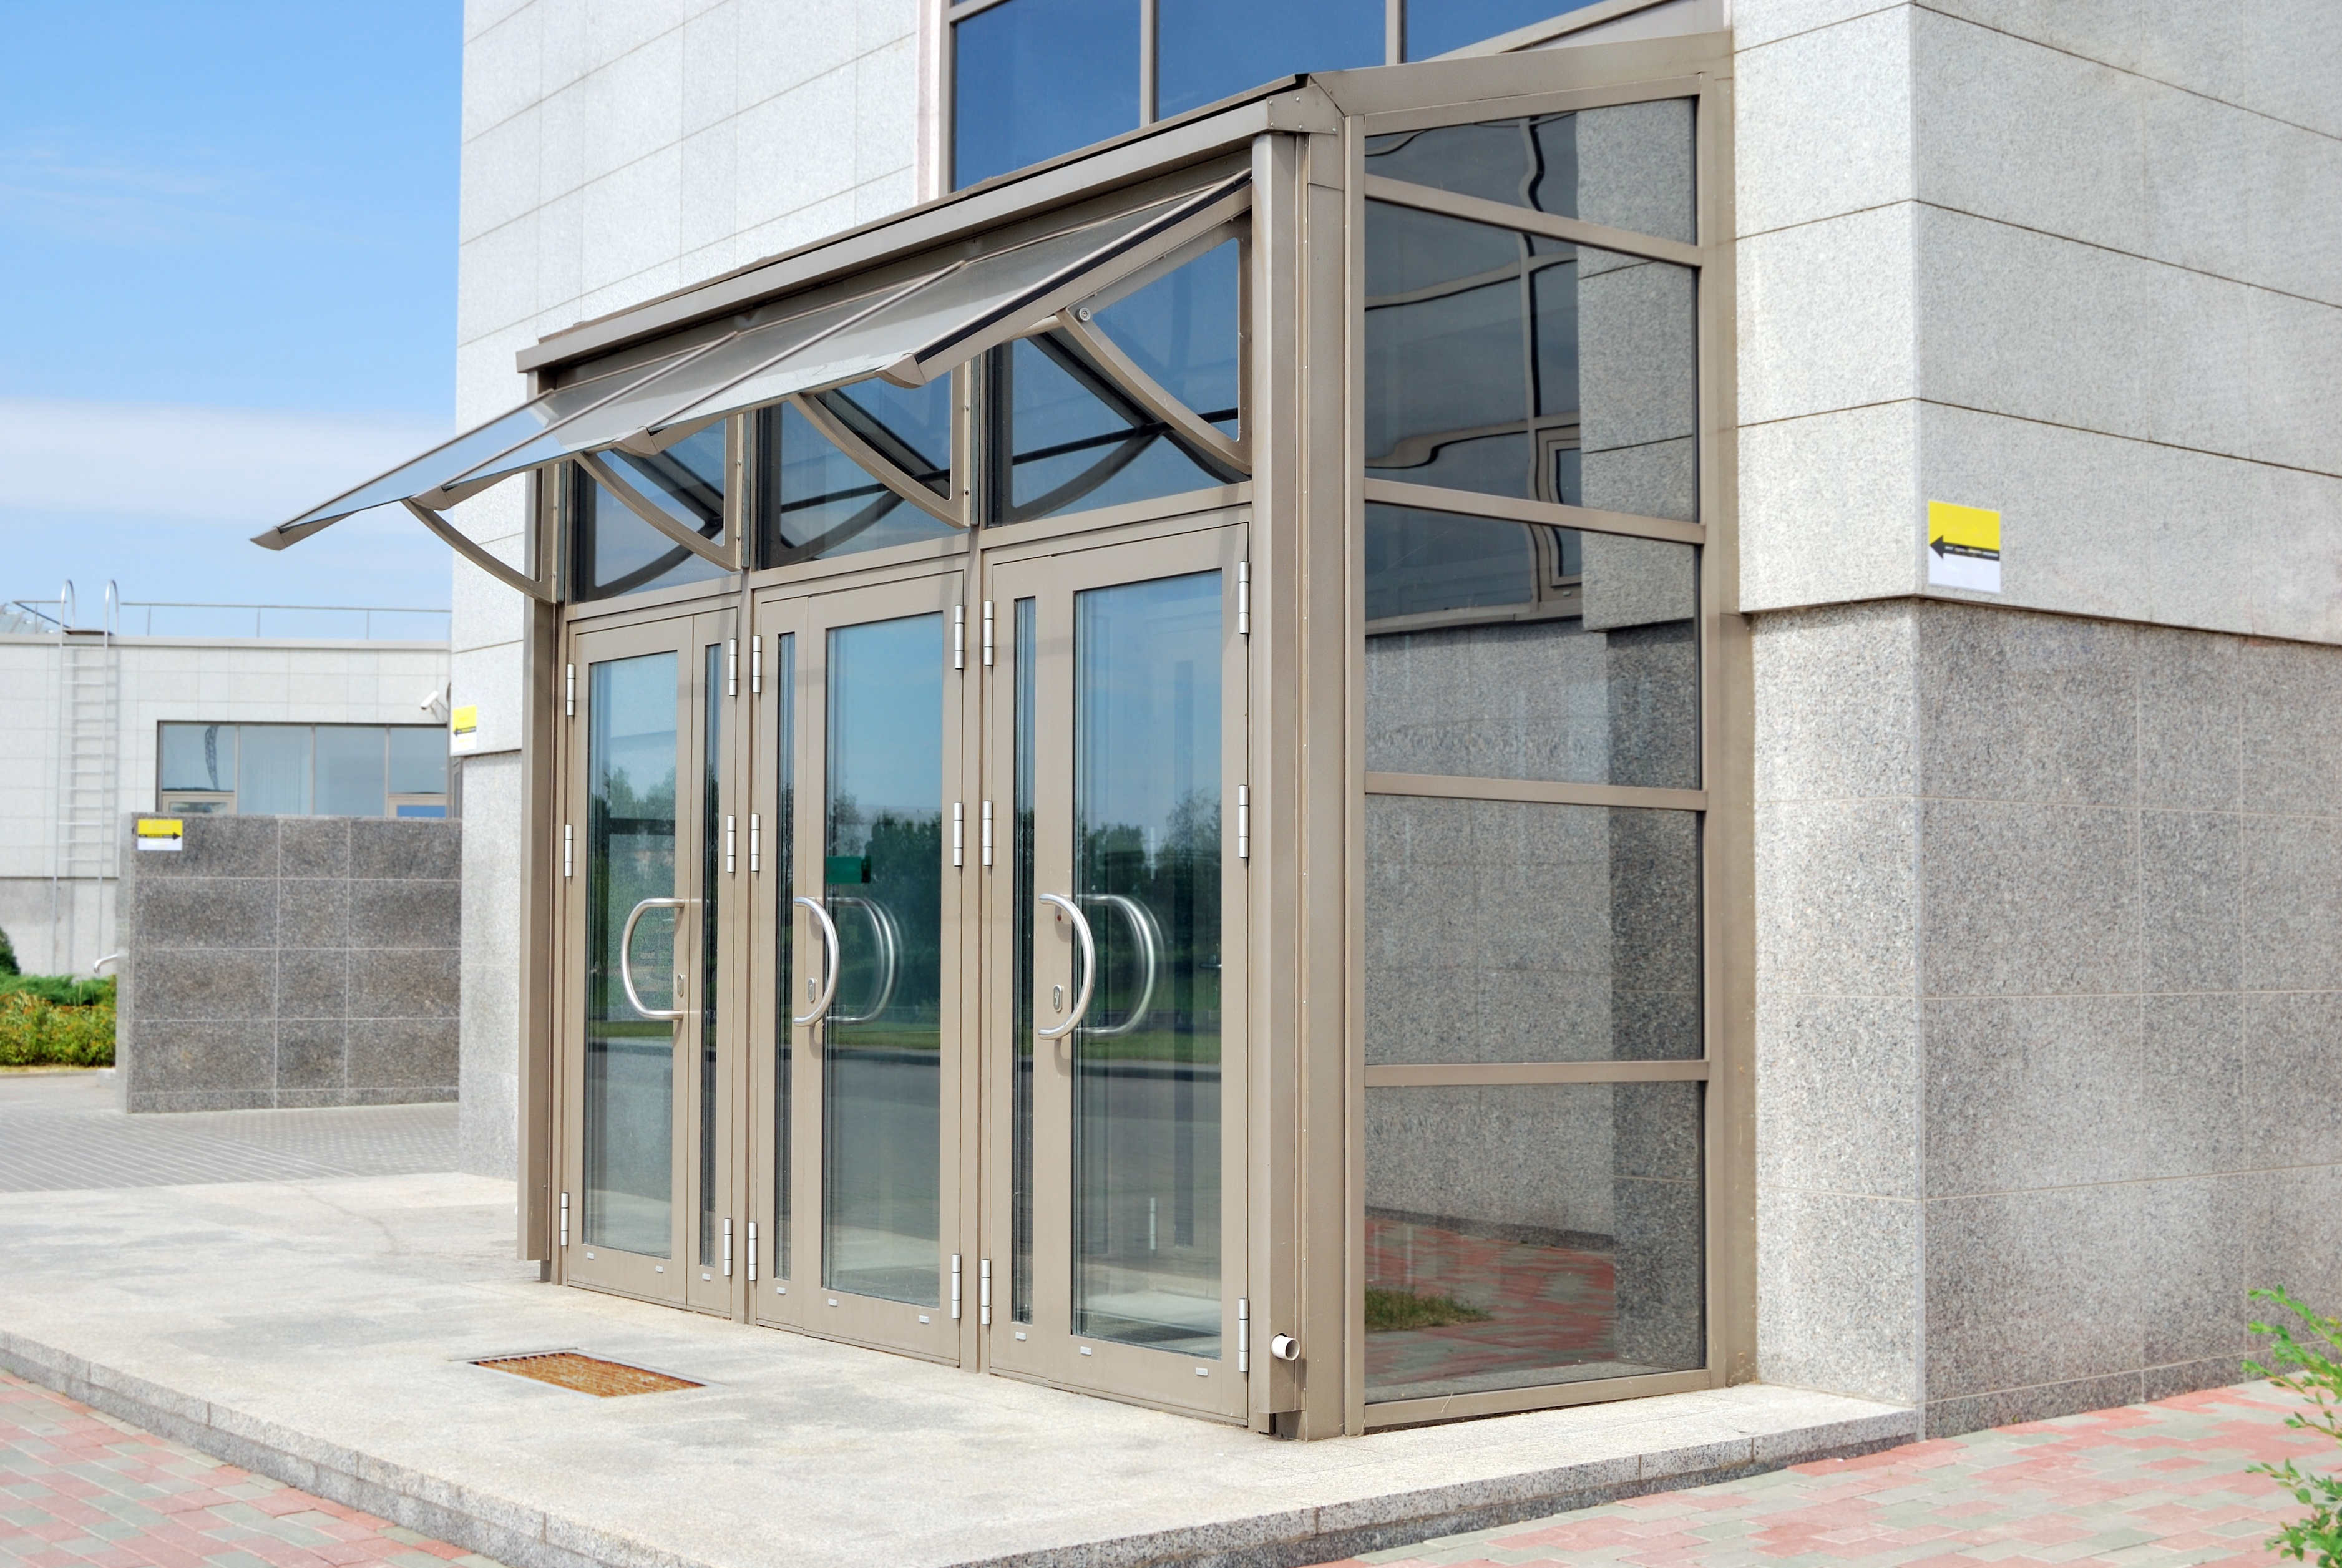 hinged doors and windows-1.jpg